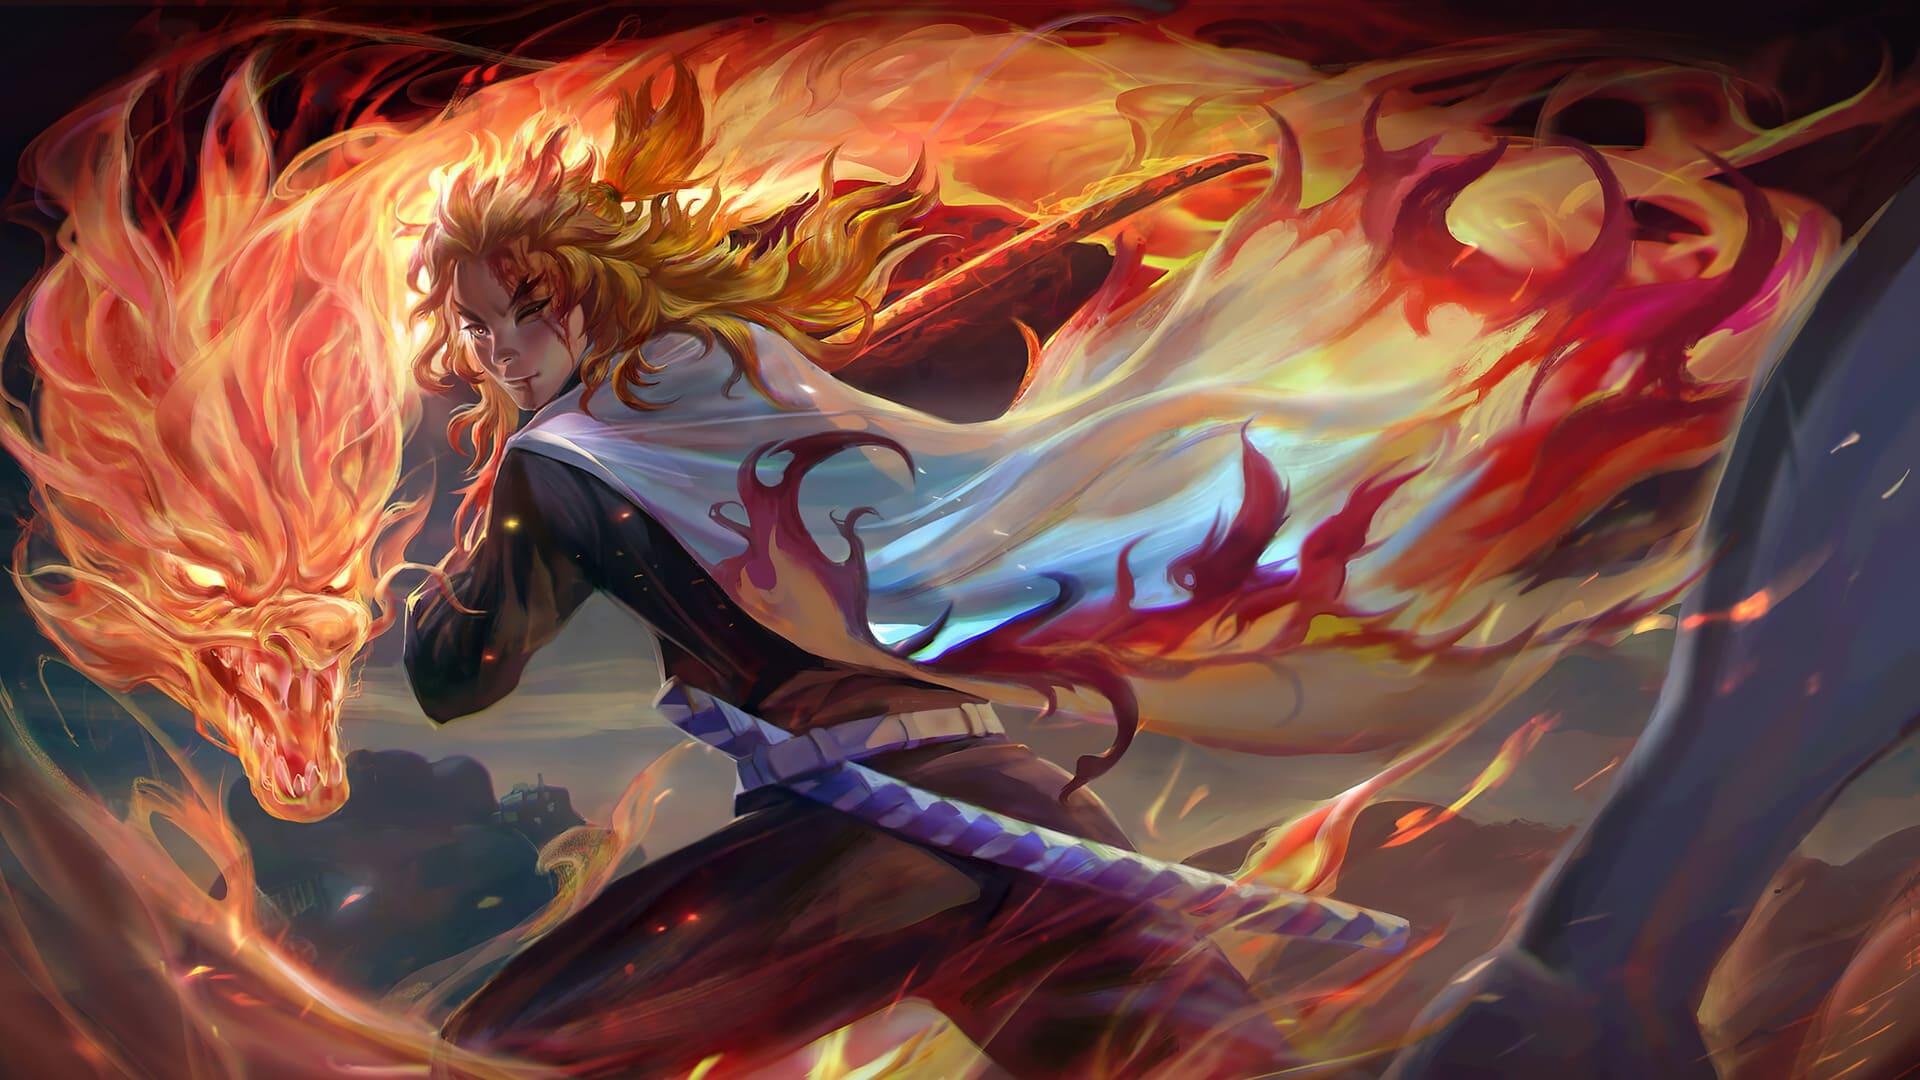 Demon Slayer free image